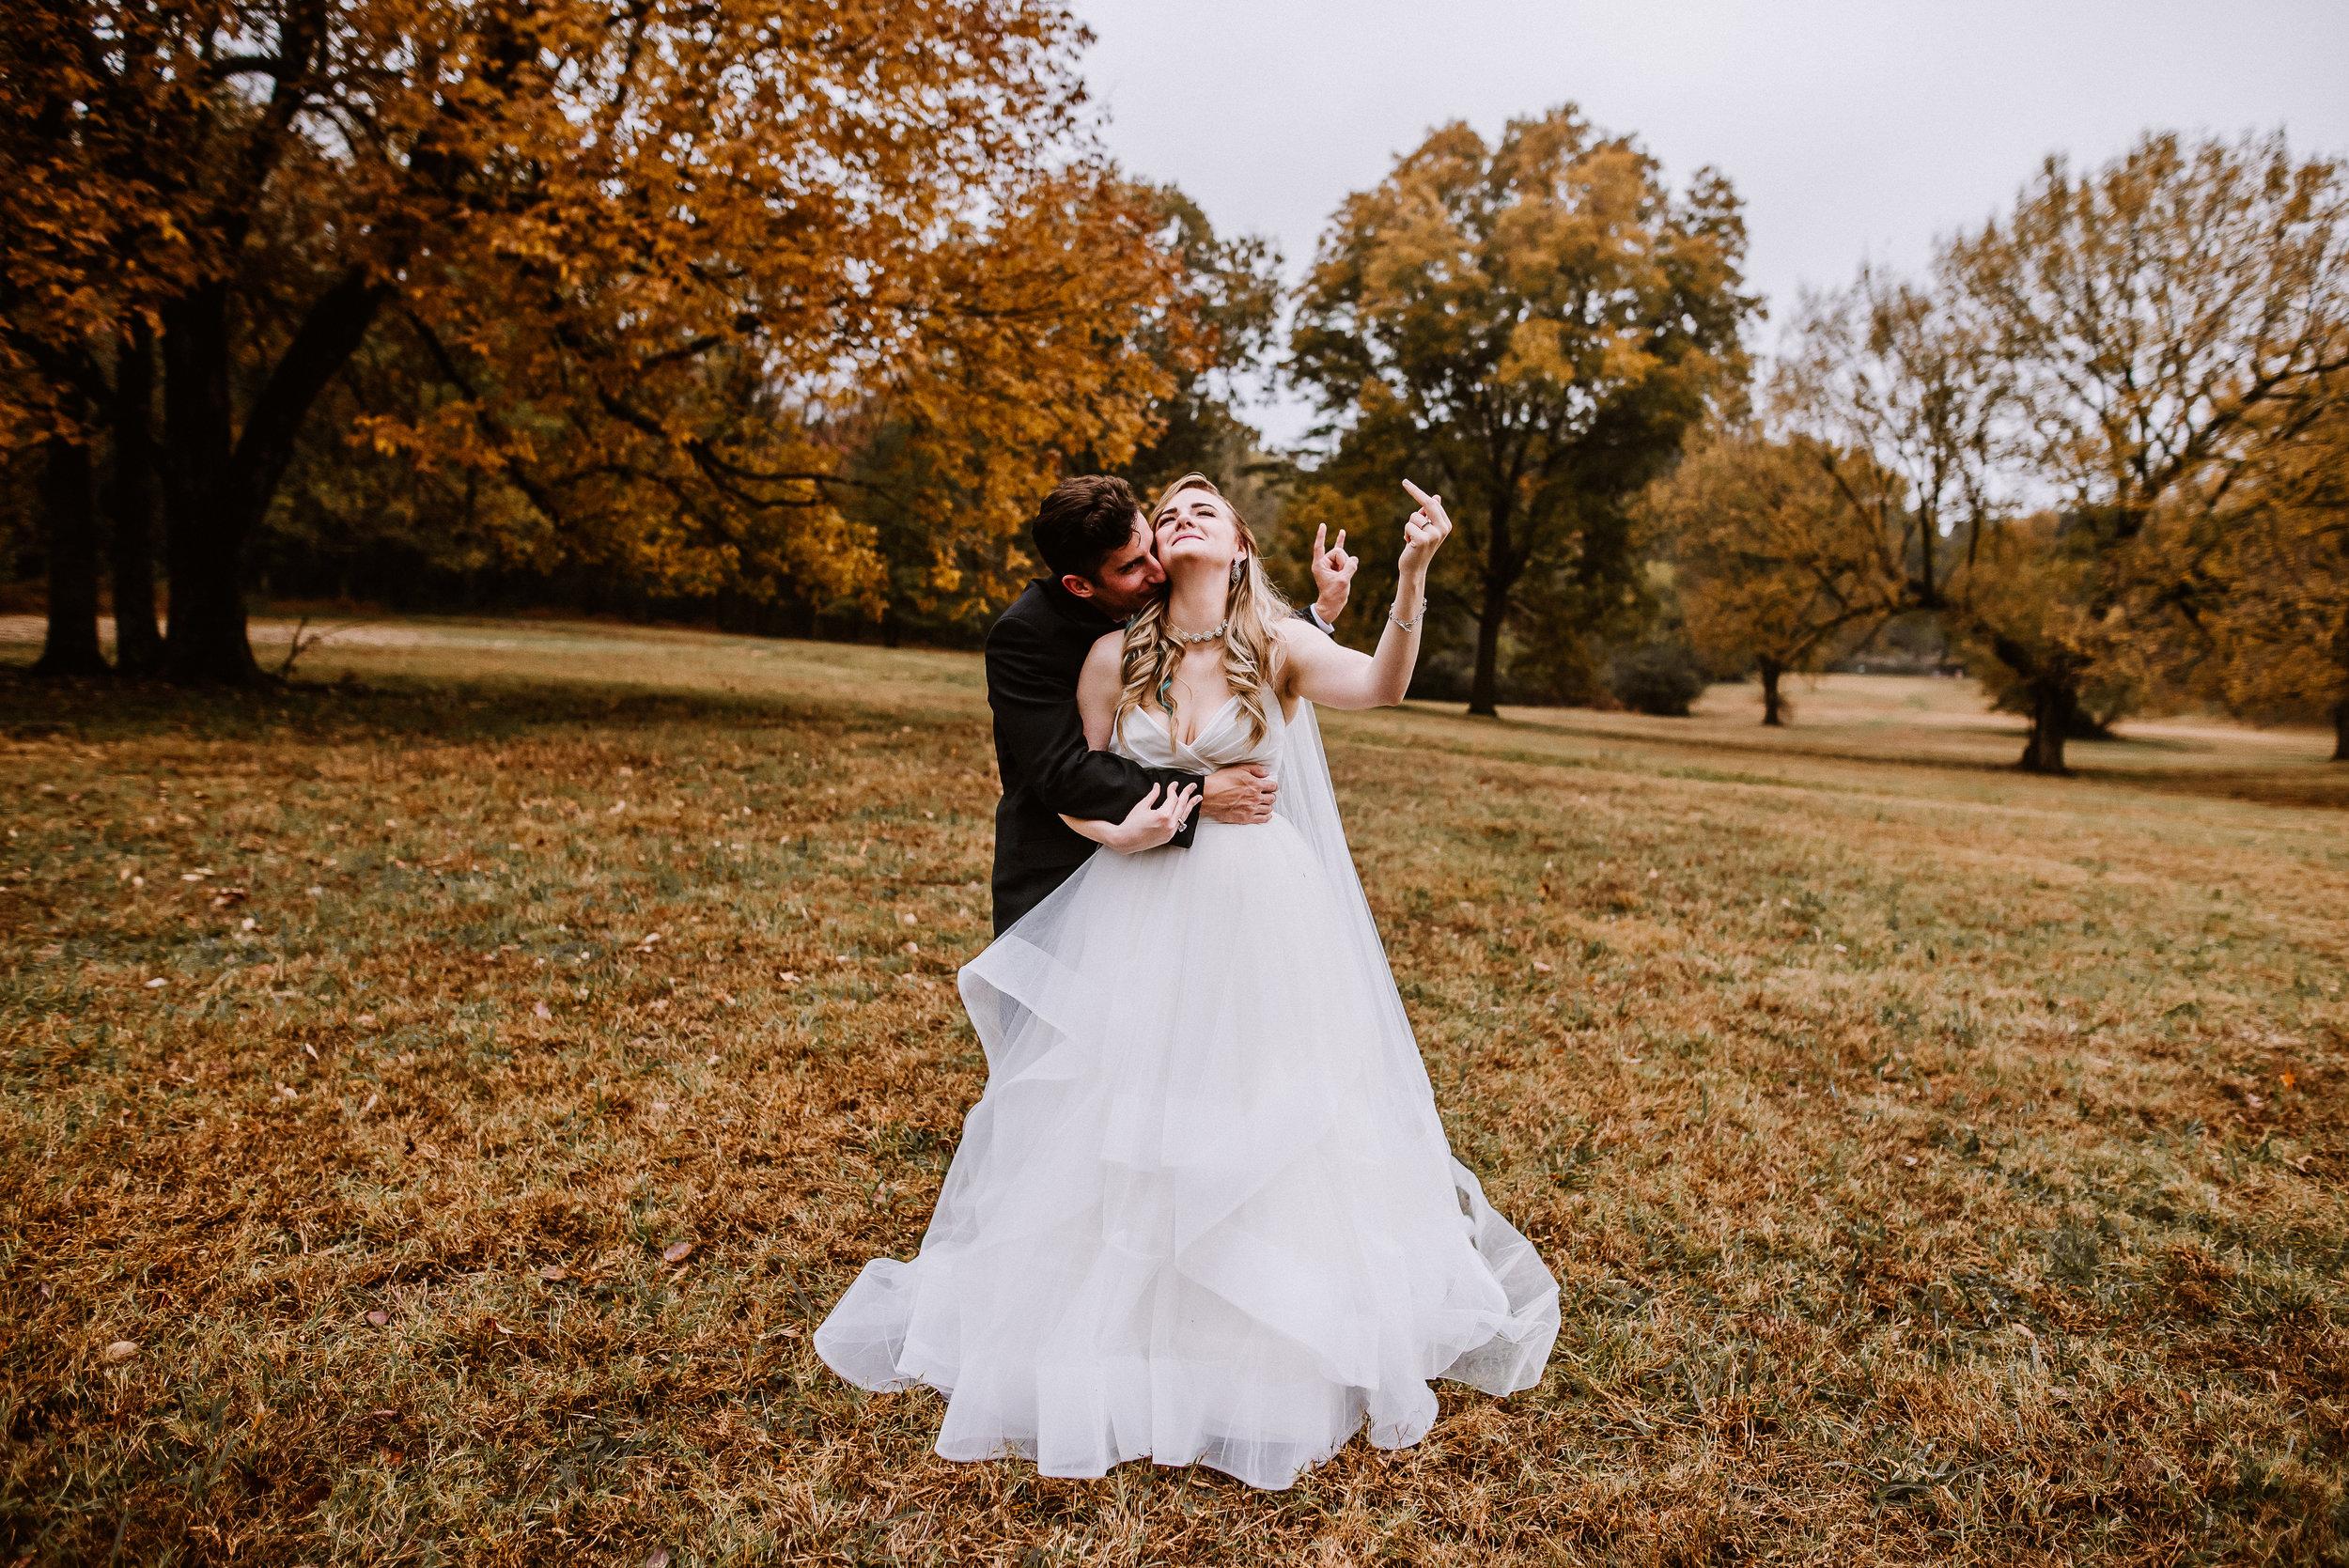 Lucchesi-Wedding_Shelby-Farms_Ashley-Benham-Photography-290.jpg